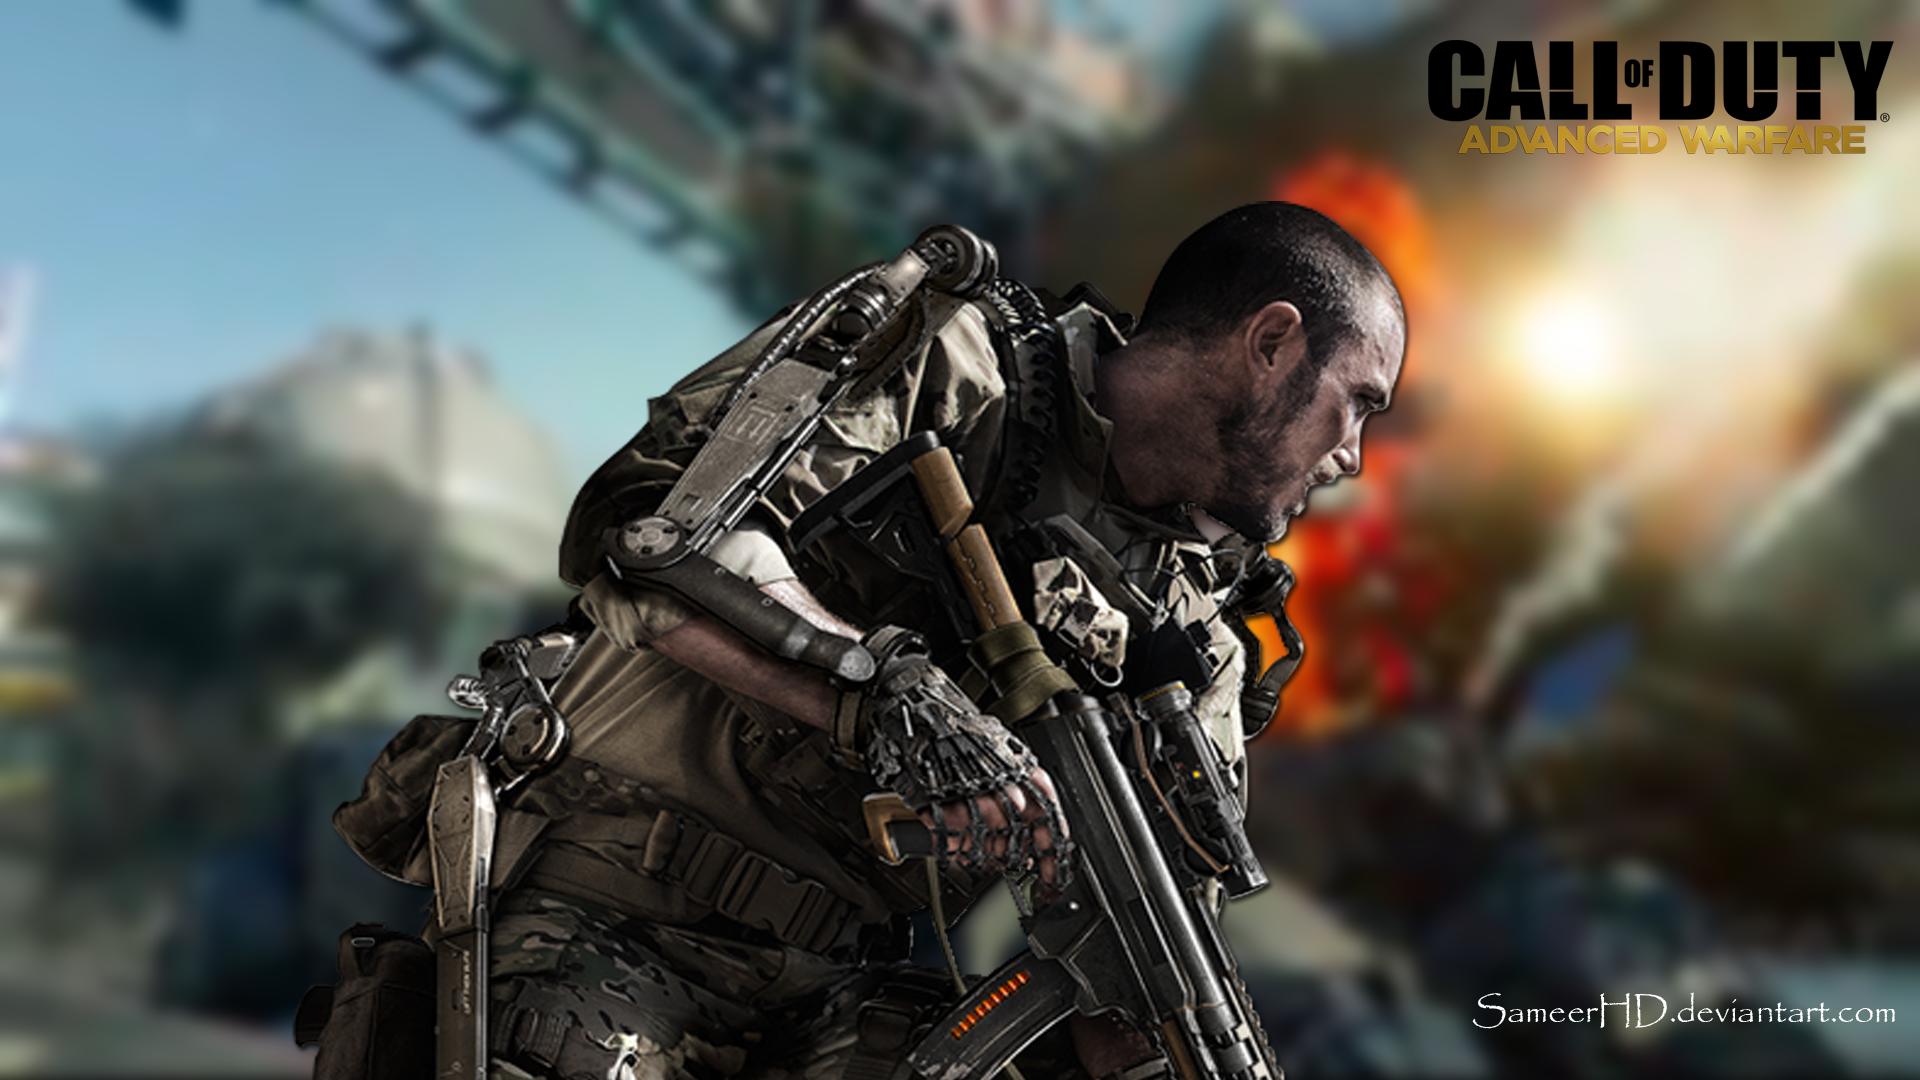 Call Of Duty Advanced Warfare Soldier Wallpaper By SameerHD